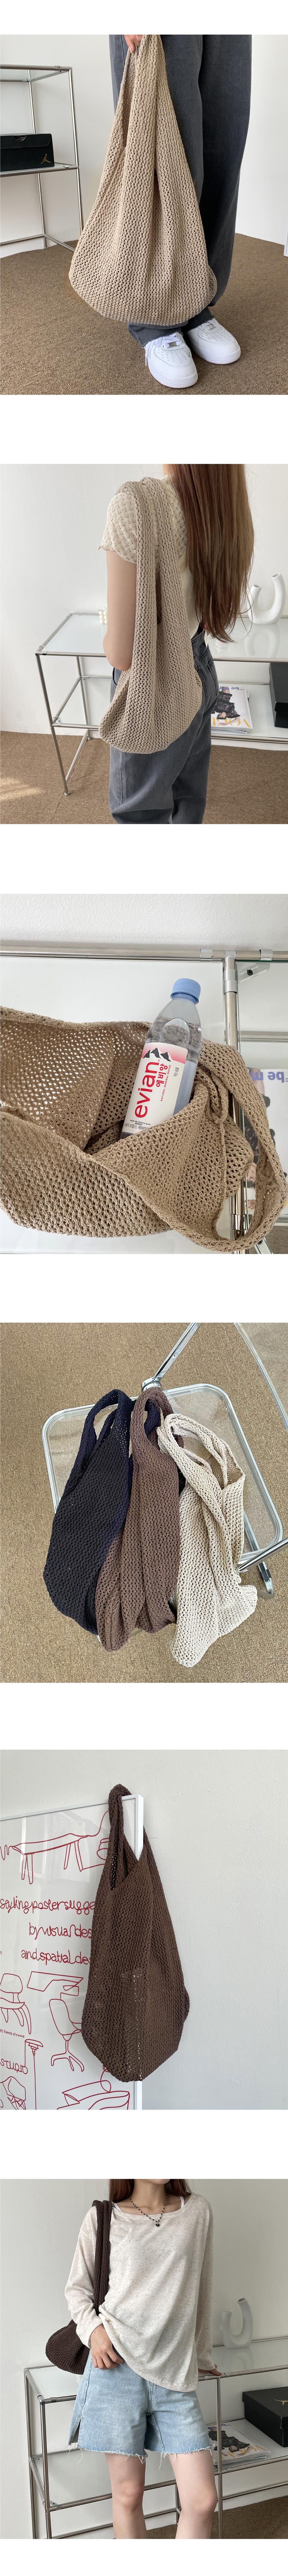 lucy summer net net hobo bag